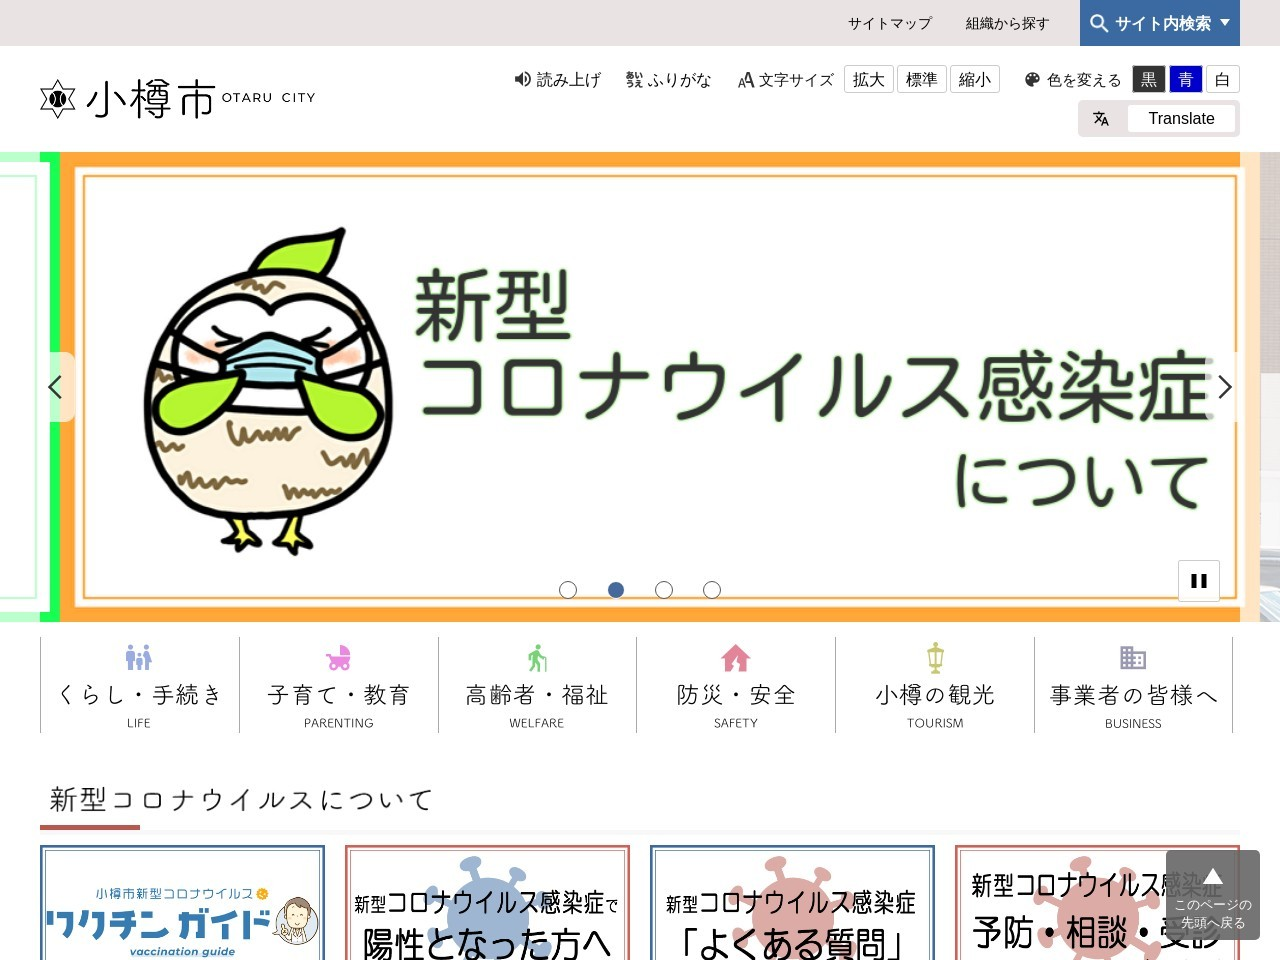 https://www.city.otaru.lg.jp/simin/gakushu_sports/bunka/artist_bank/artist_itiran/kaiga/shadoumugen.html